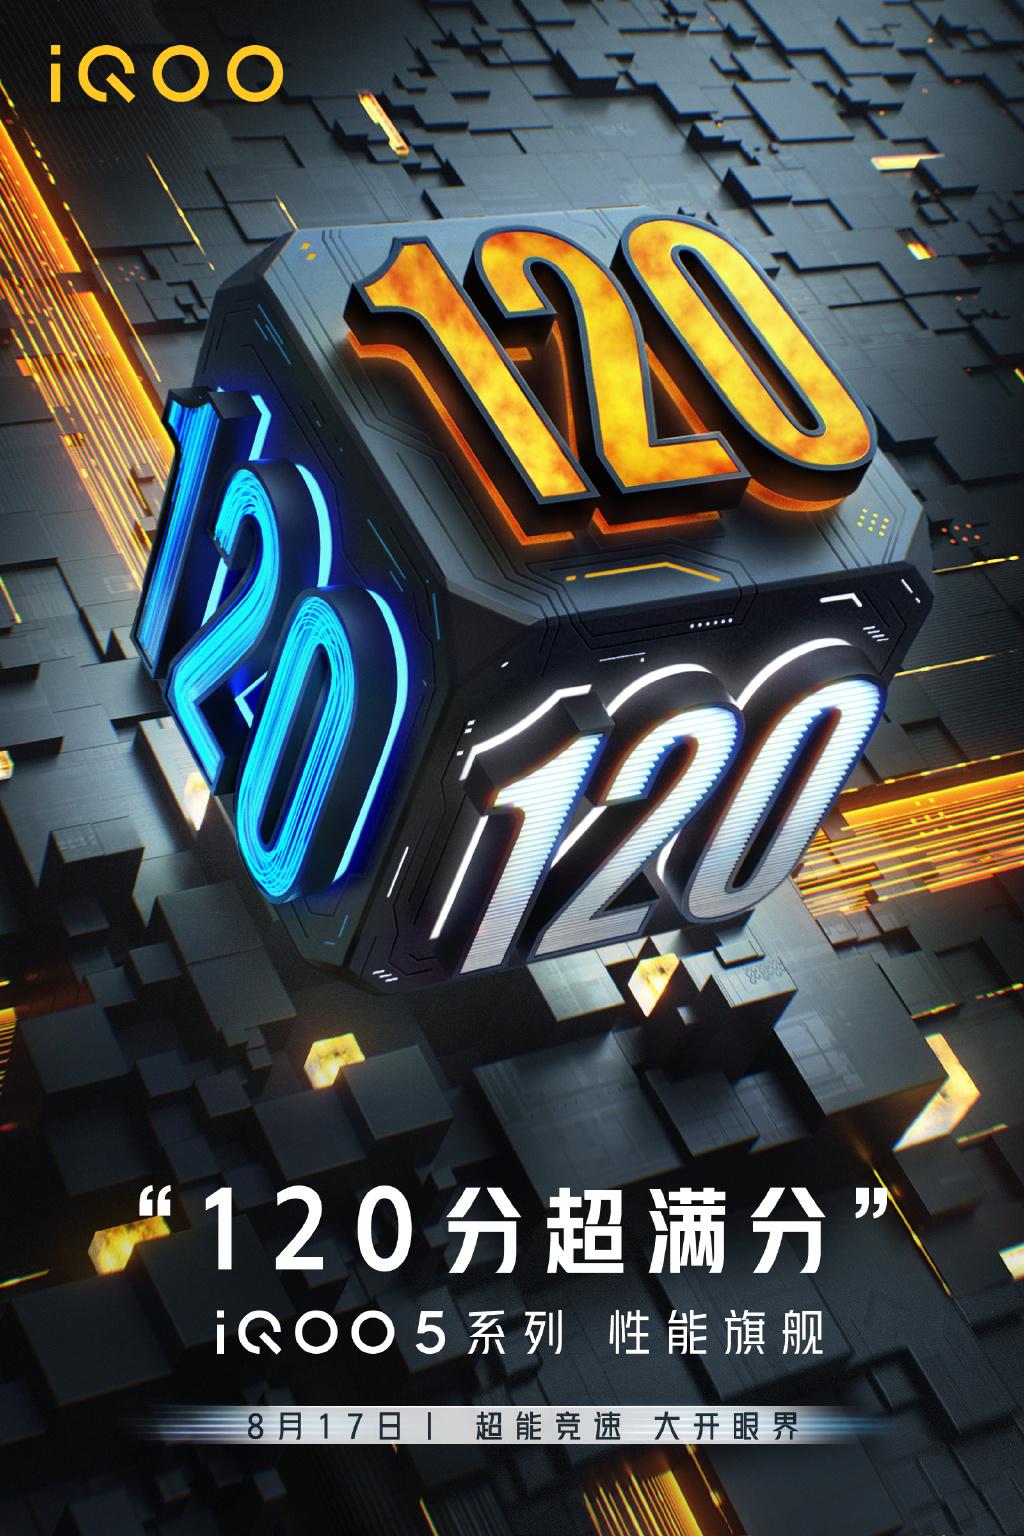 iQOO 5核心配置揭晓:凑齐三个120